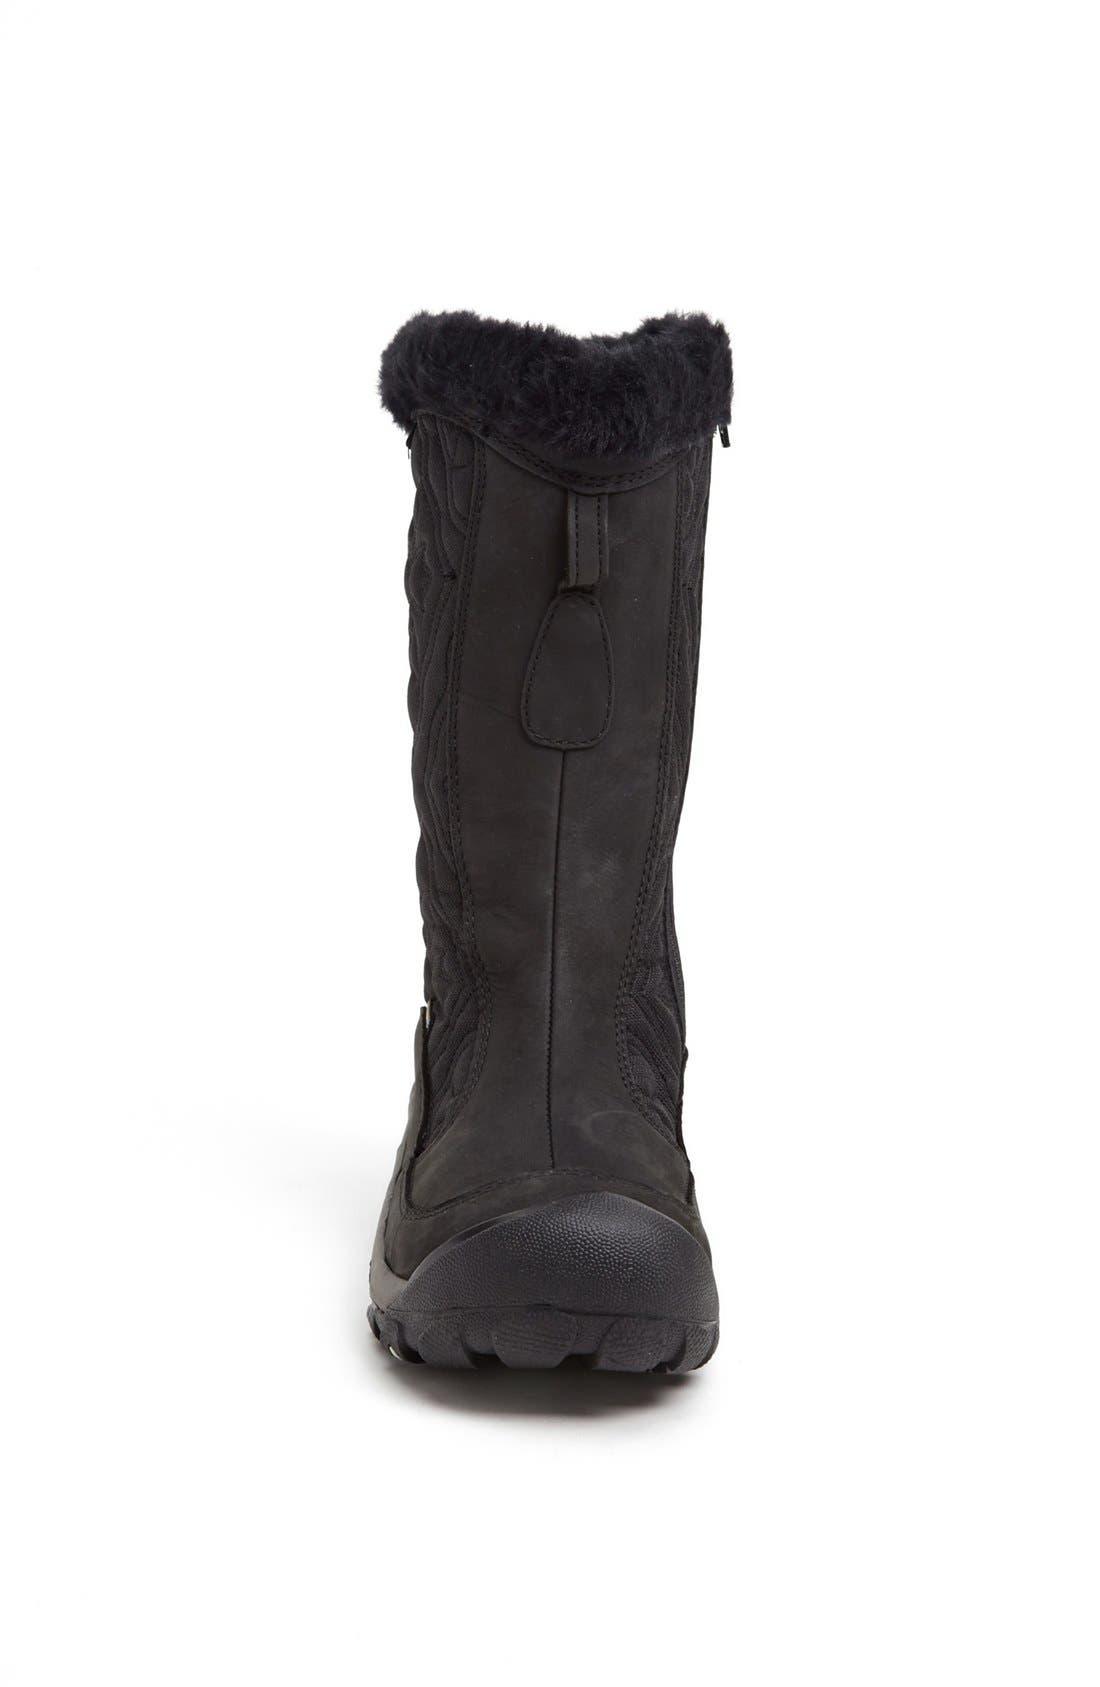 Alternate Image 3  - Keen 'Betty II' Waterproof Snow Boot